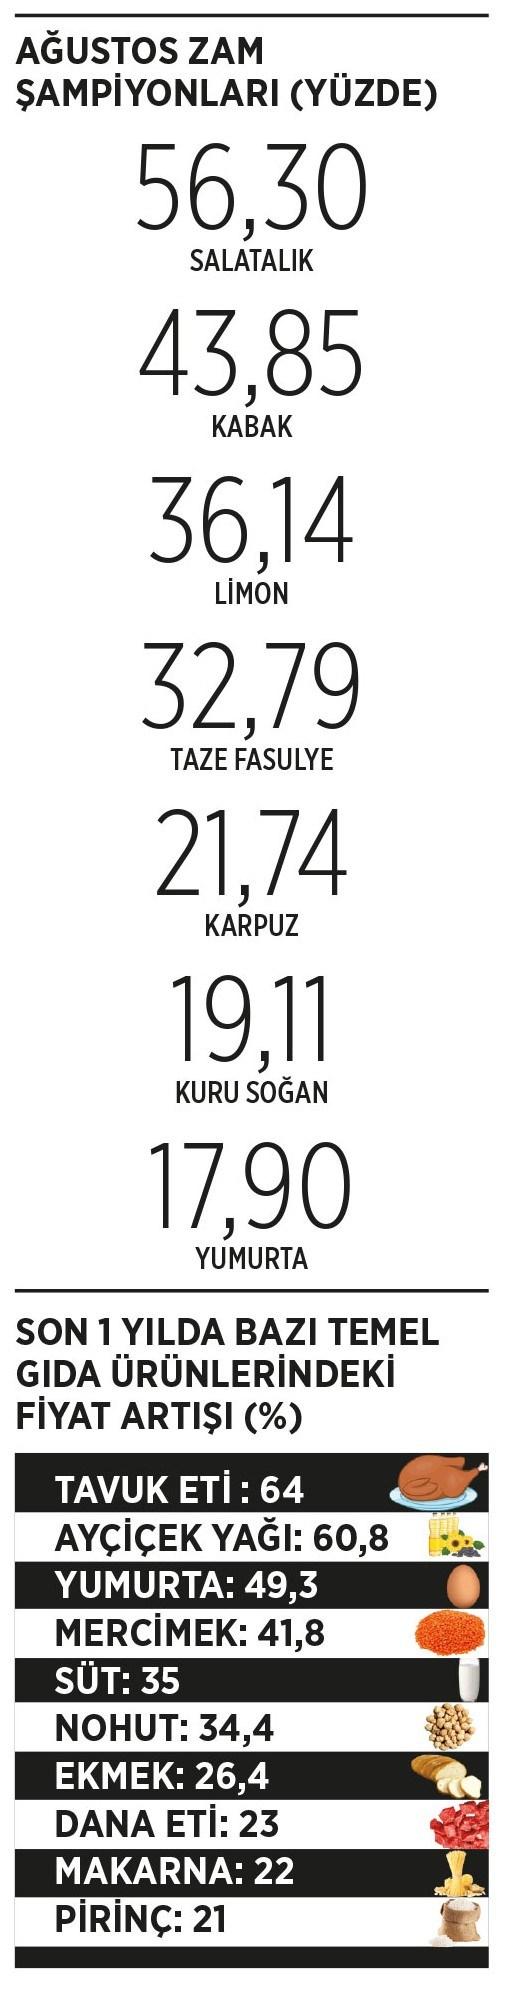 enflasyon-son-28-ayin-zirvesinde-yoksullasma-seyri-917763-1.